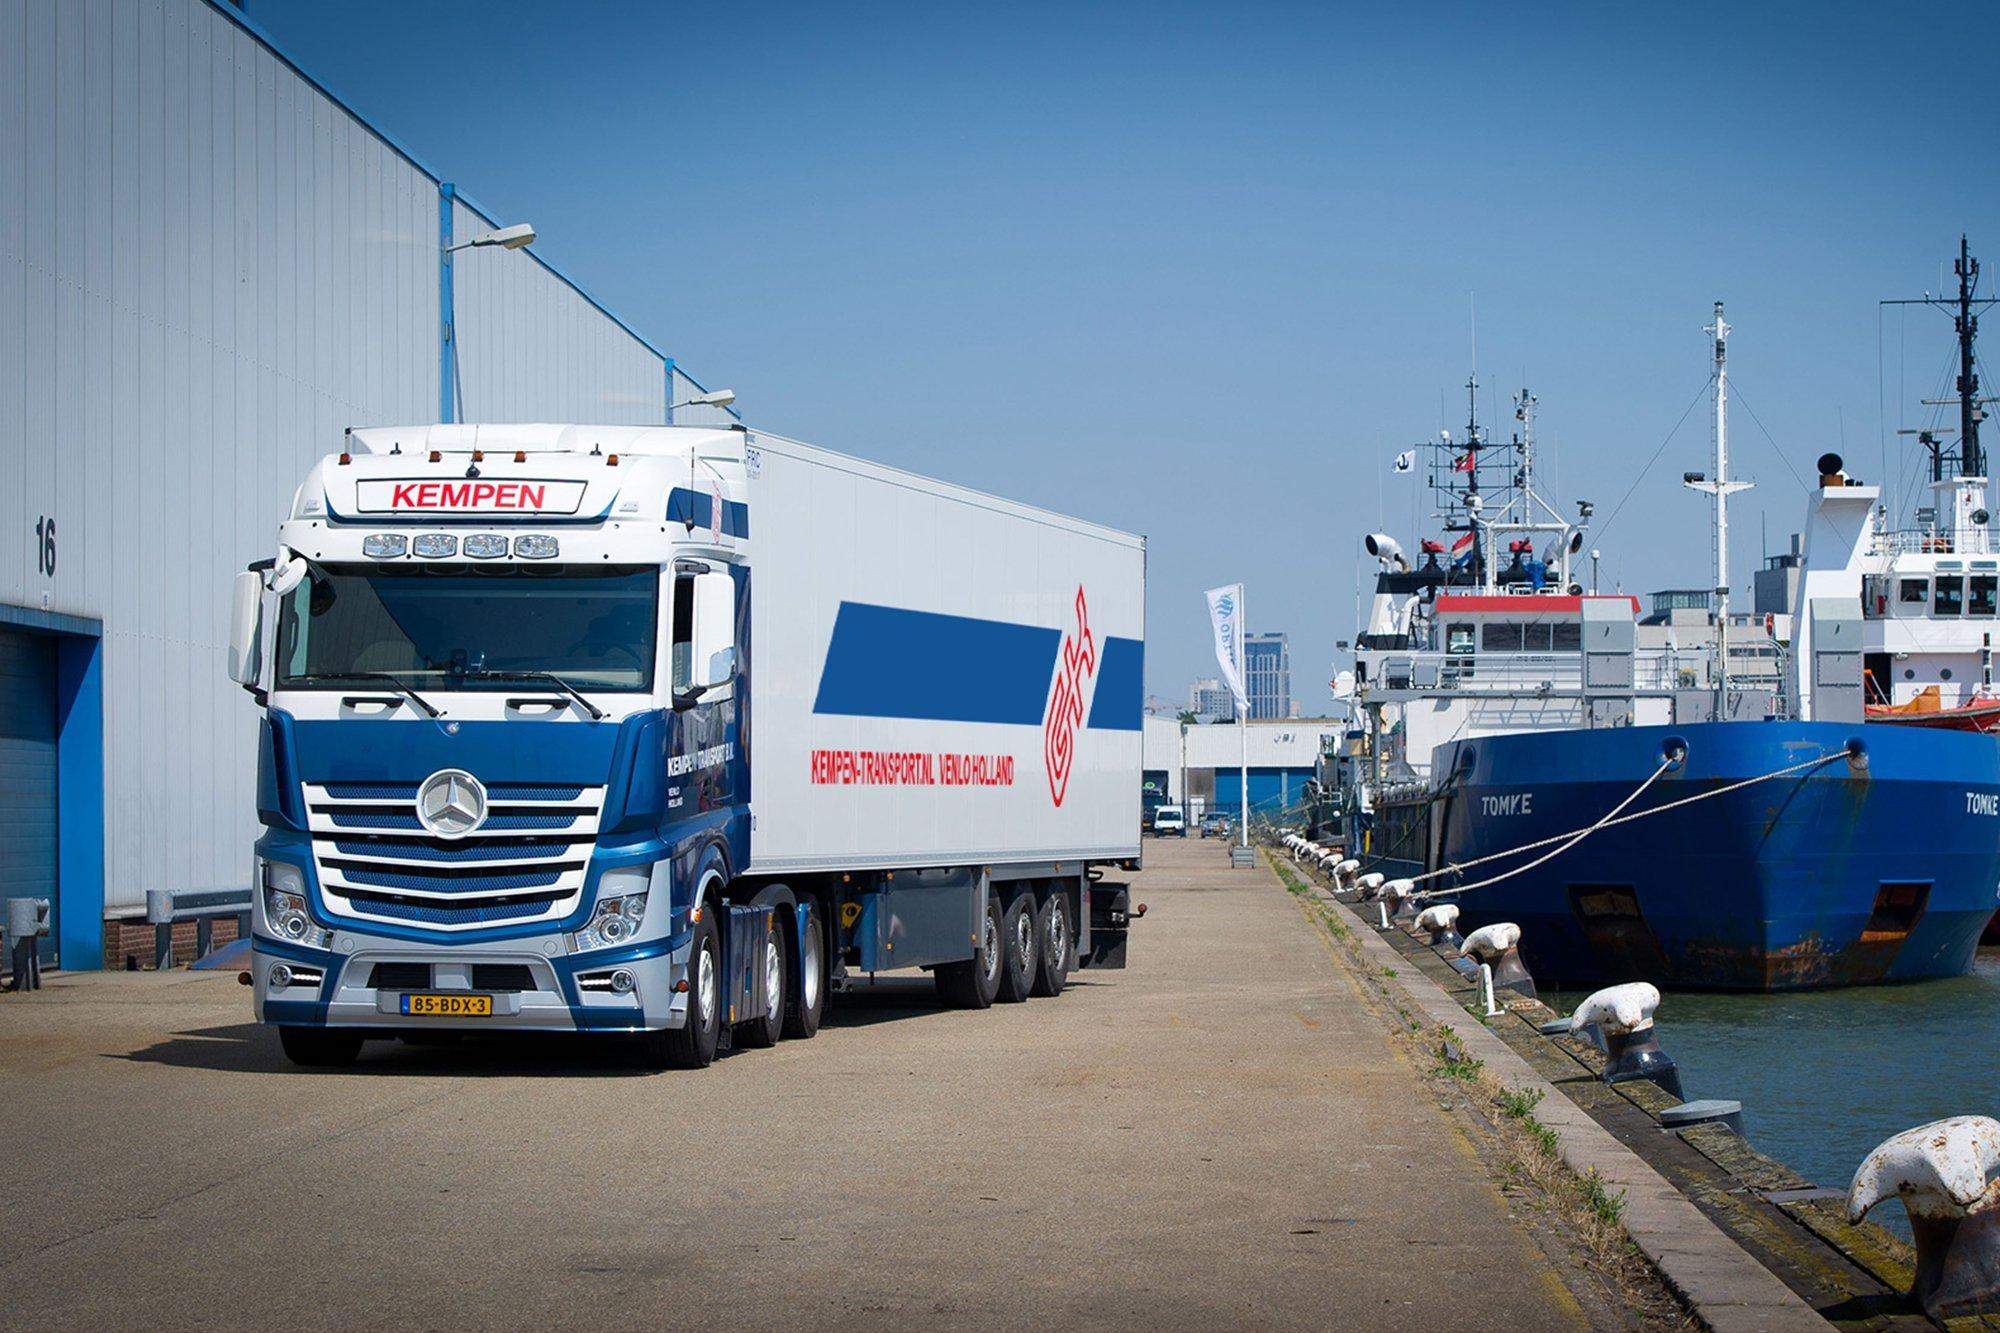 Kempen Transport